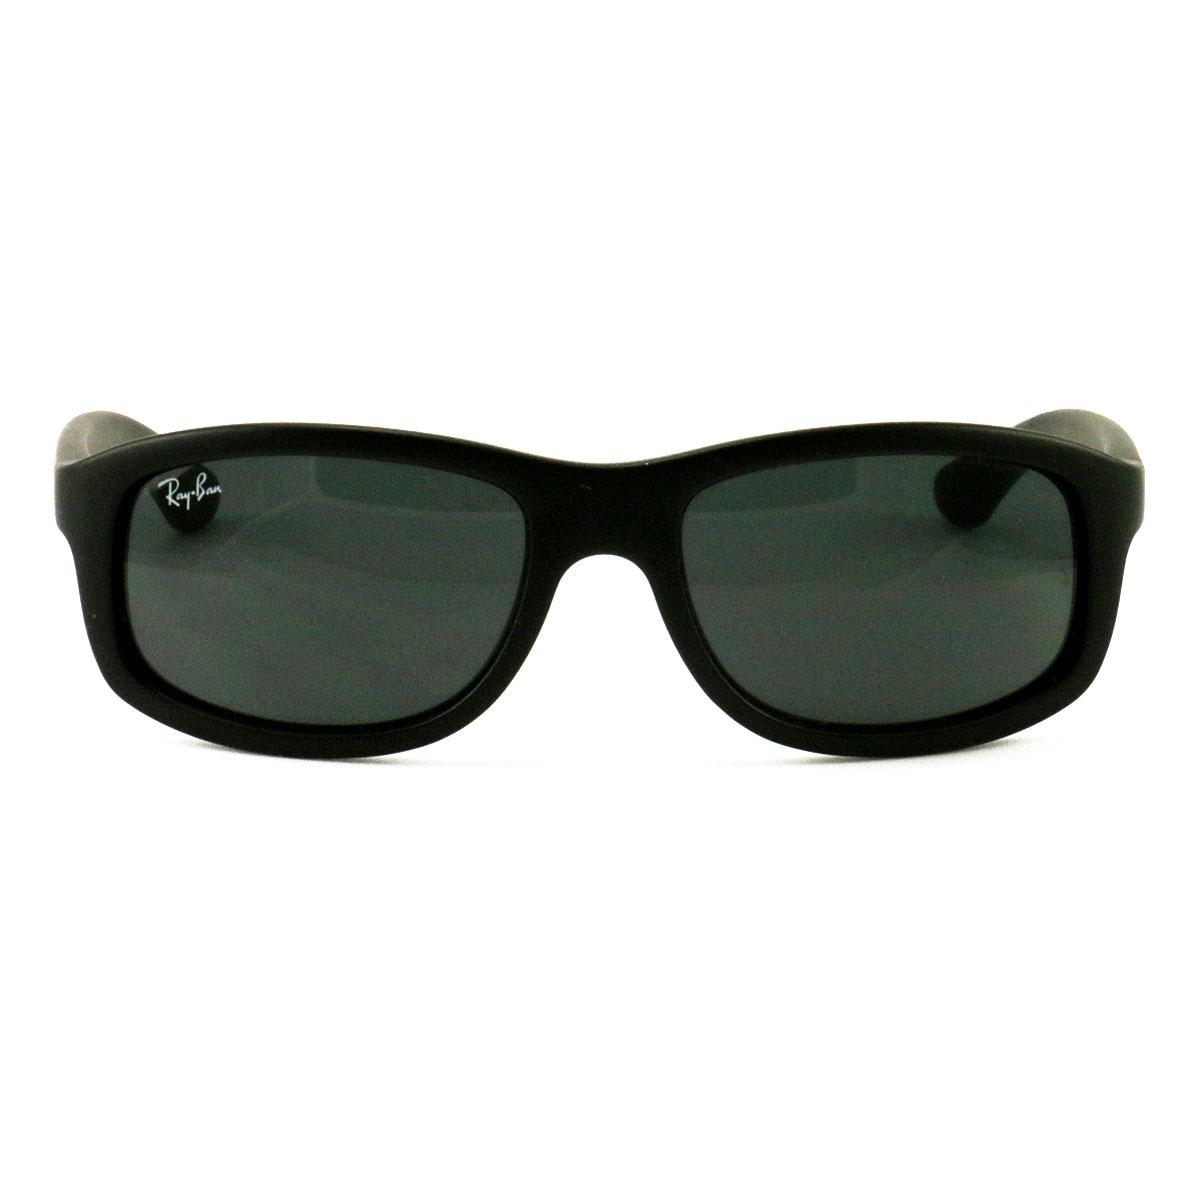 d2ade4722d Ray Ban Jr Sunglasses RJ9058S 7001 87 Black Yellow 50 15 115 ...